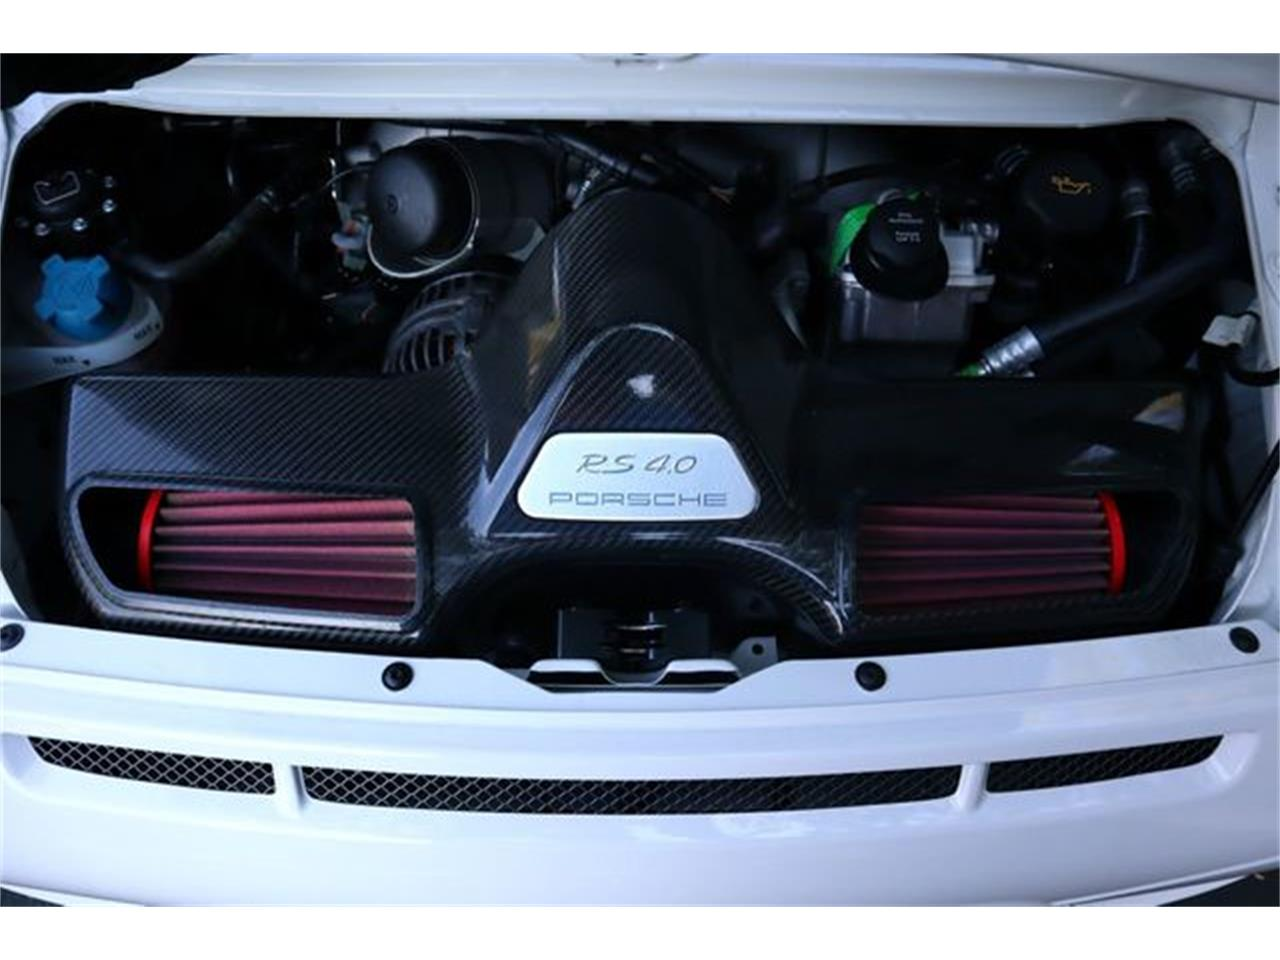 2011 Porsche 911 GT3 RS 4.0 (CC-1416167) for sale in Scottsdale, Arizona